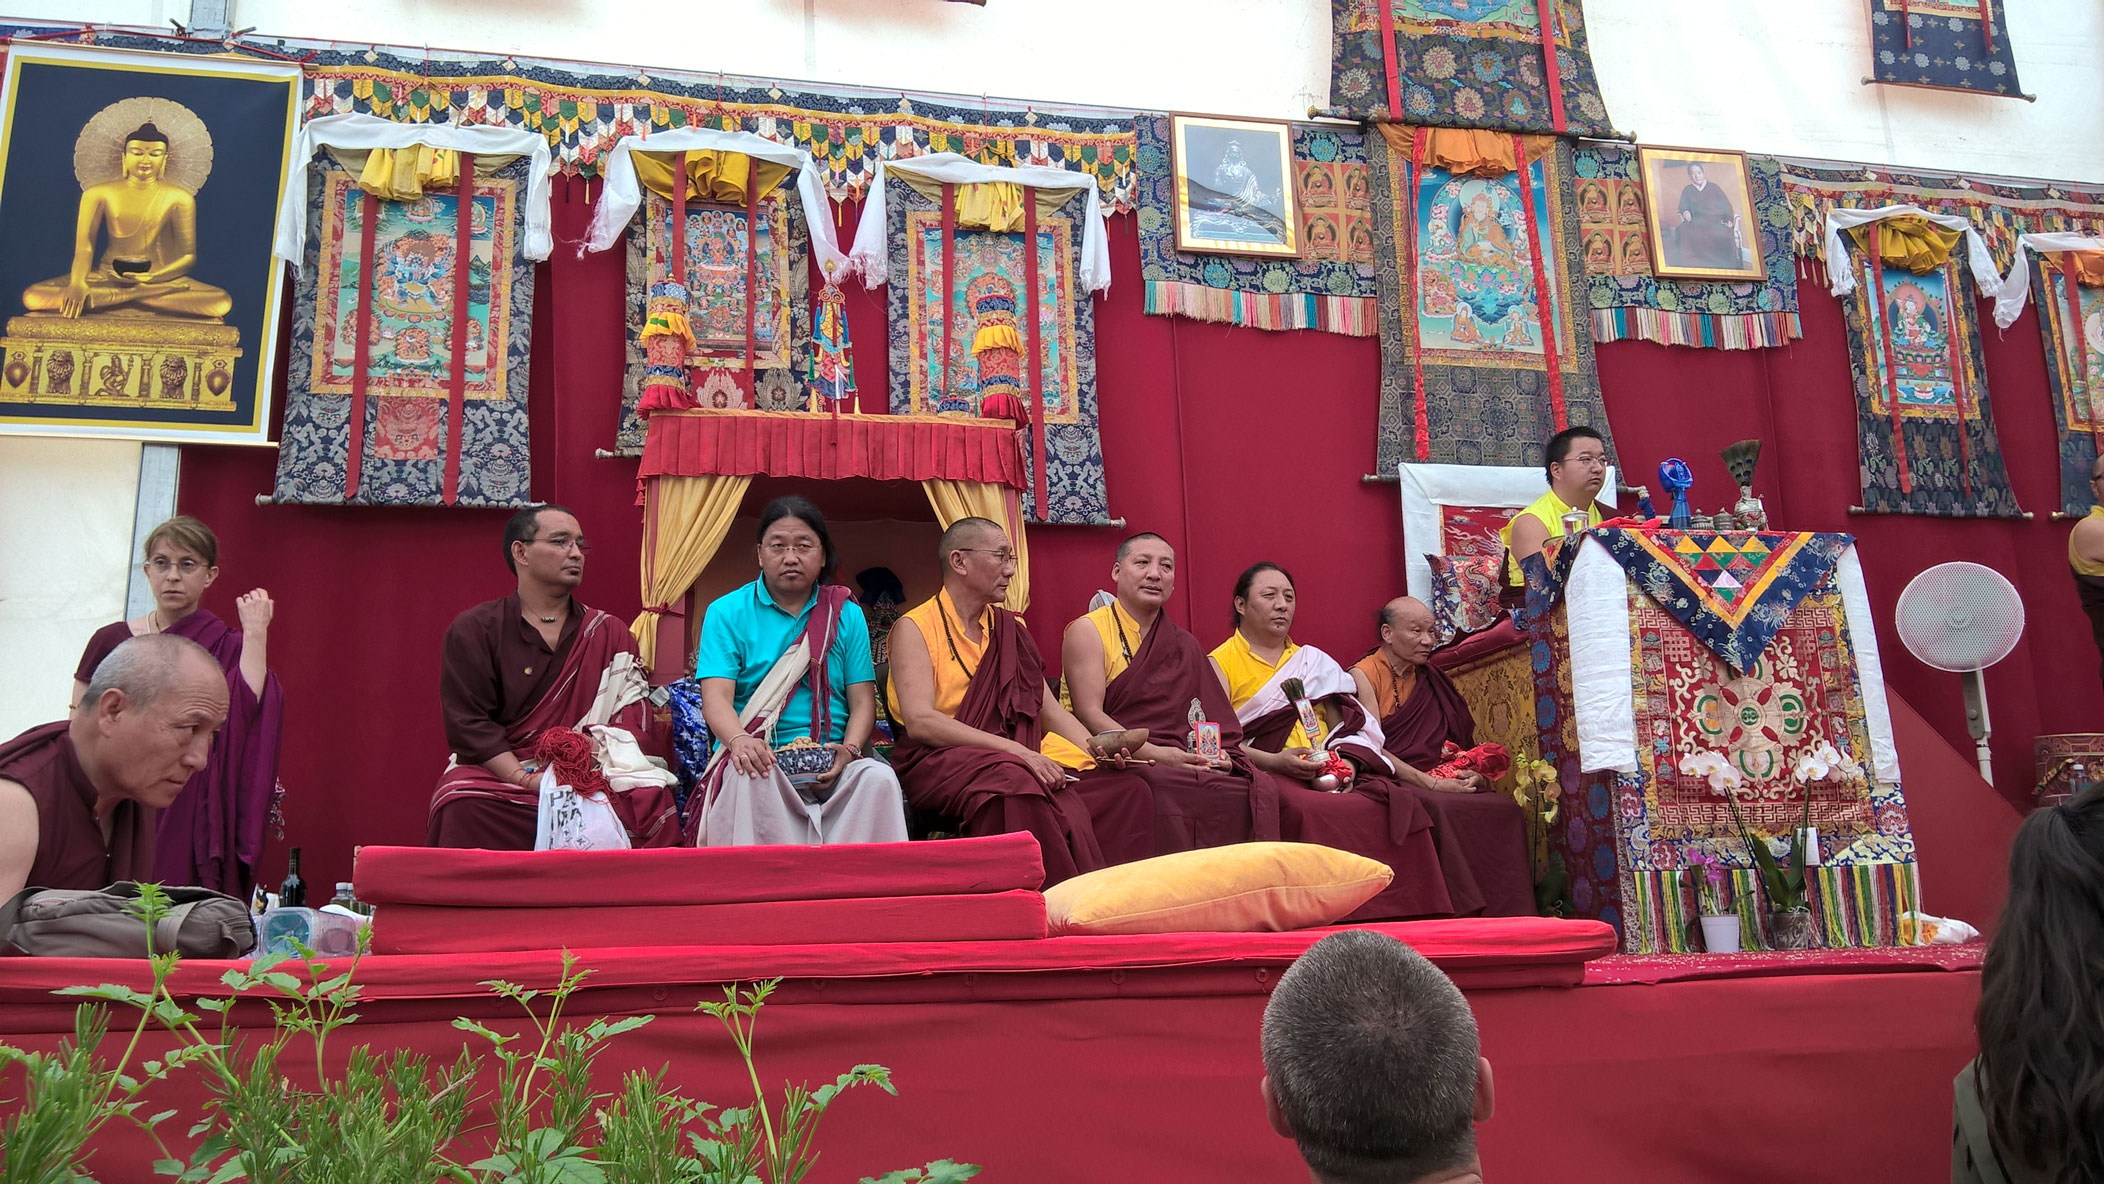 SS-Dudjom-Rinpoche-Sangye-Pema-Zhepa-evento-valencia-julio-2019-07